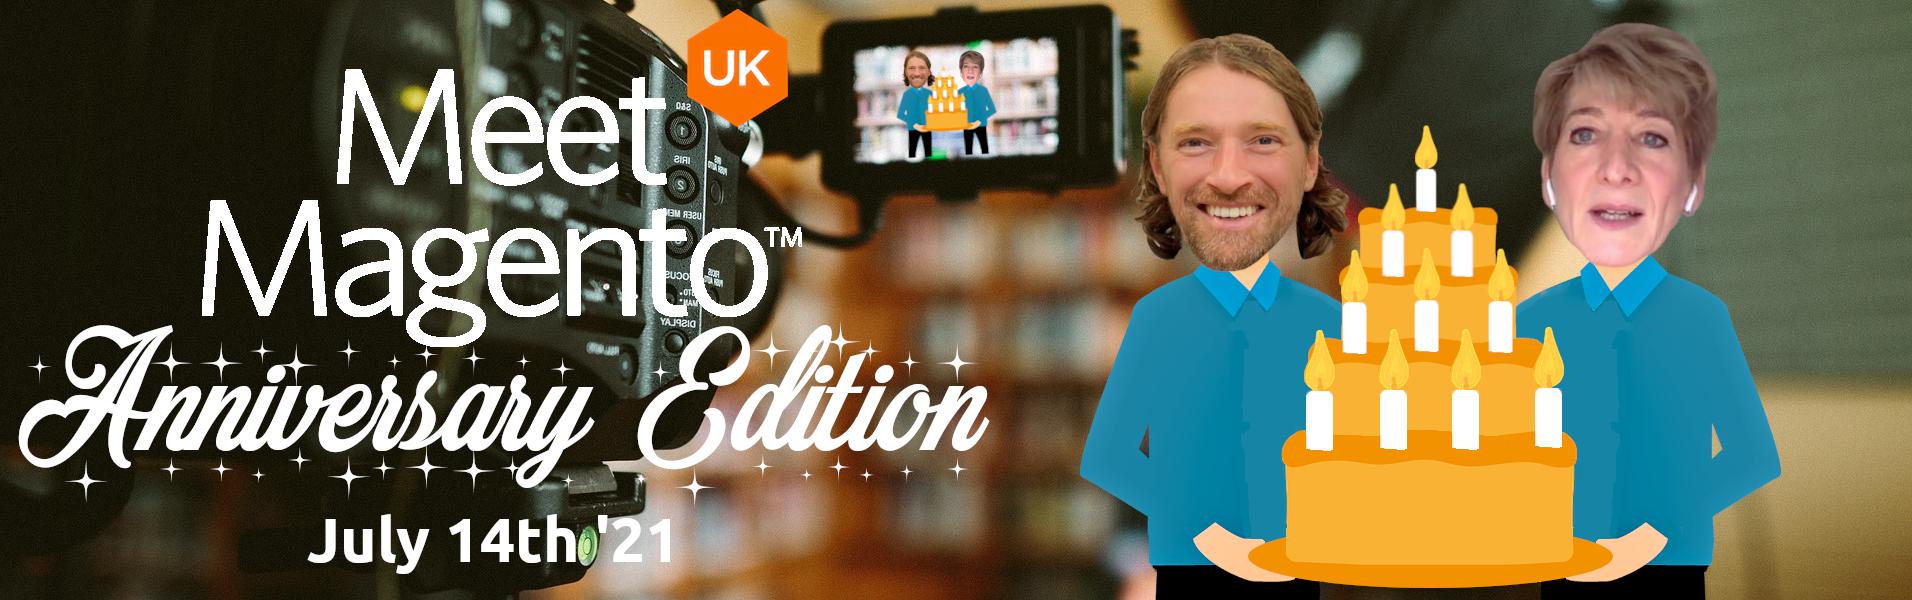 Meet Magento UK '21 - Andy Mulcahy, Performance Team at Google & Marion Freijsen.